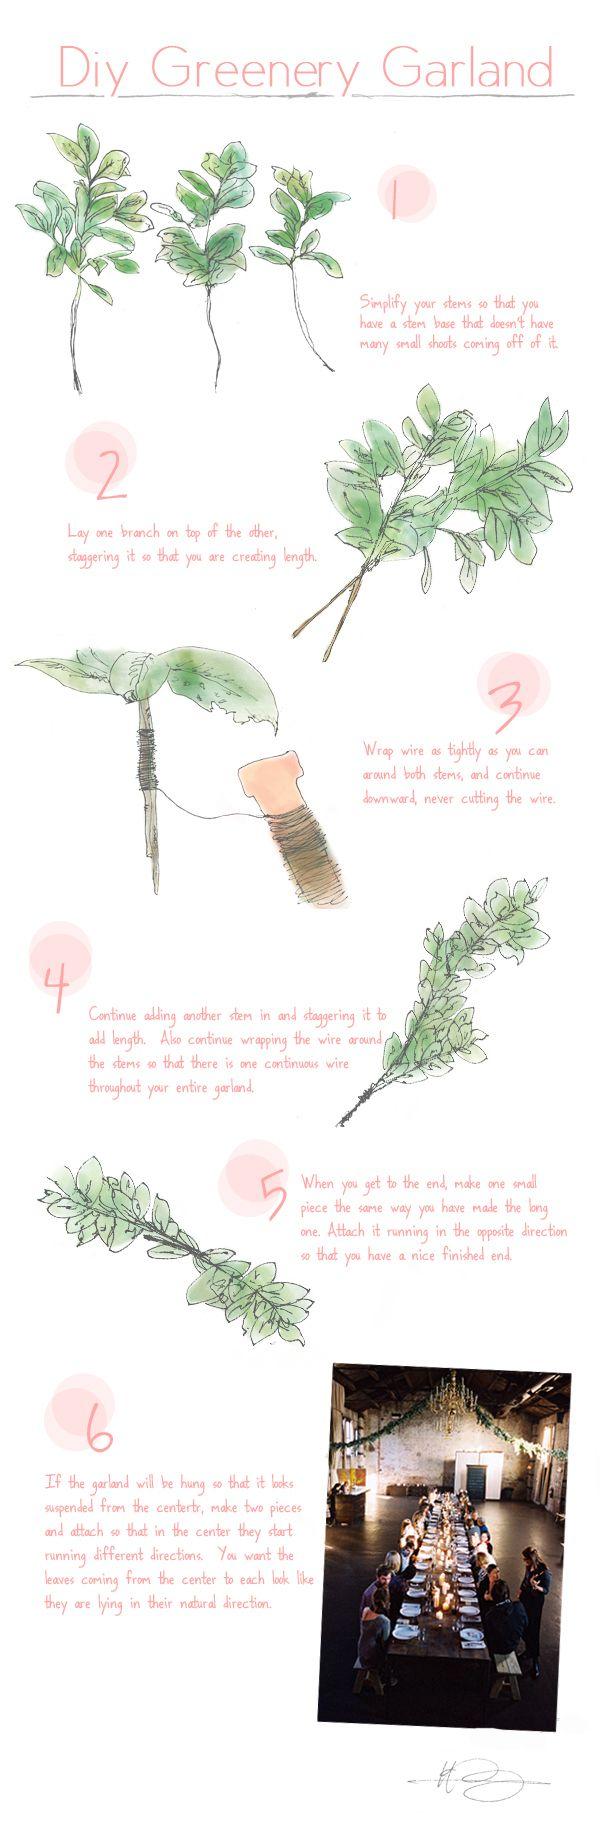 DIY greenery garland